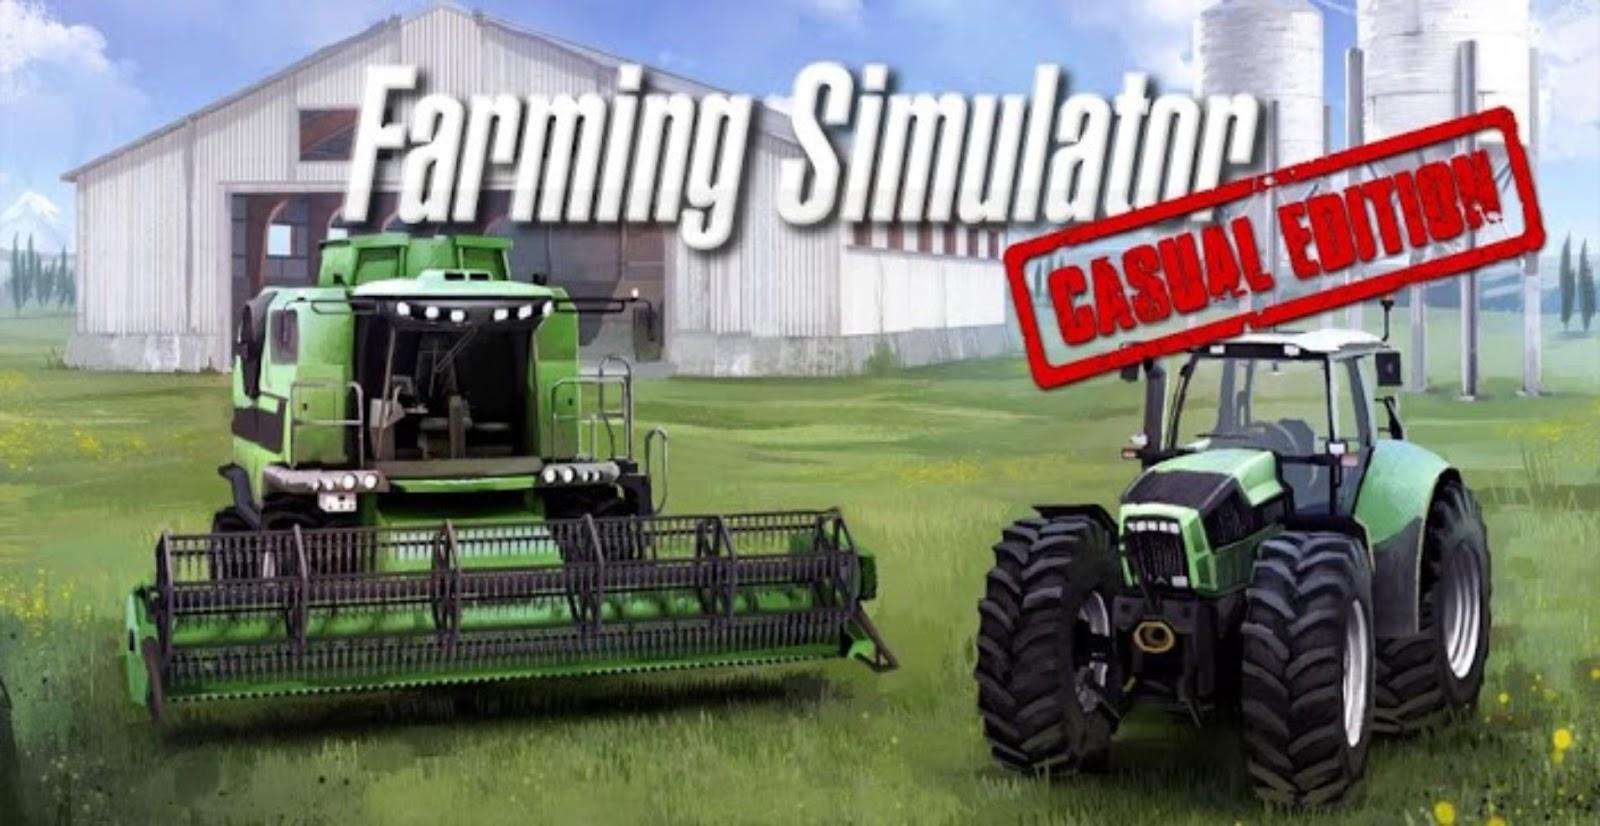 Farming Simulator v1.0.9 Apk | Android Games Download